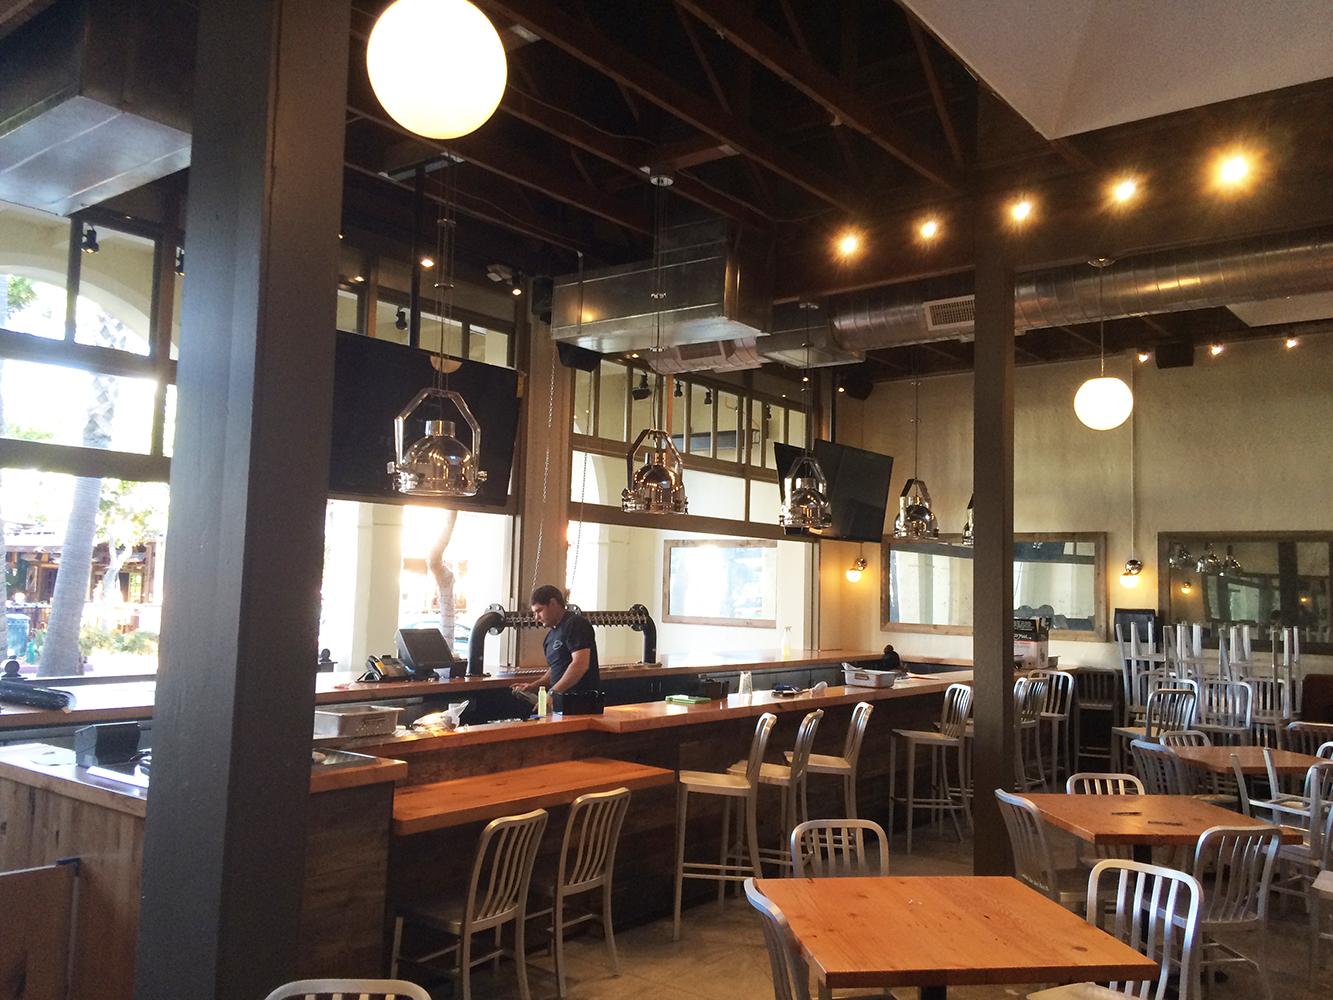 Patxis Pizza Santa Barbara Restaurant Design  Kevin Moore